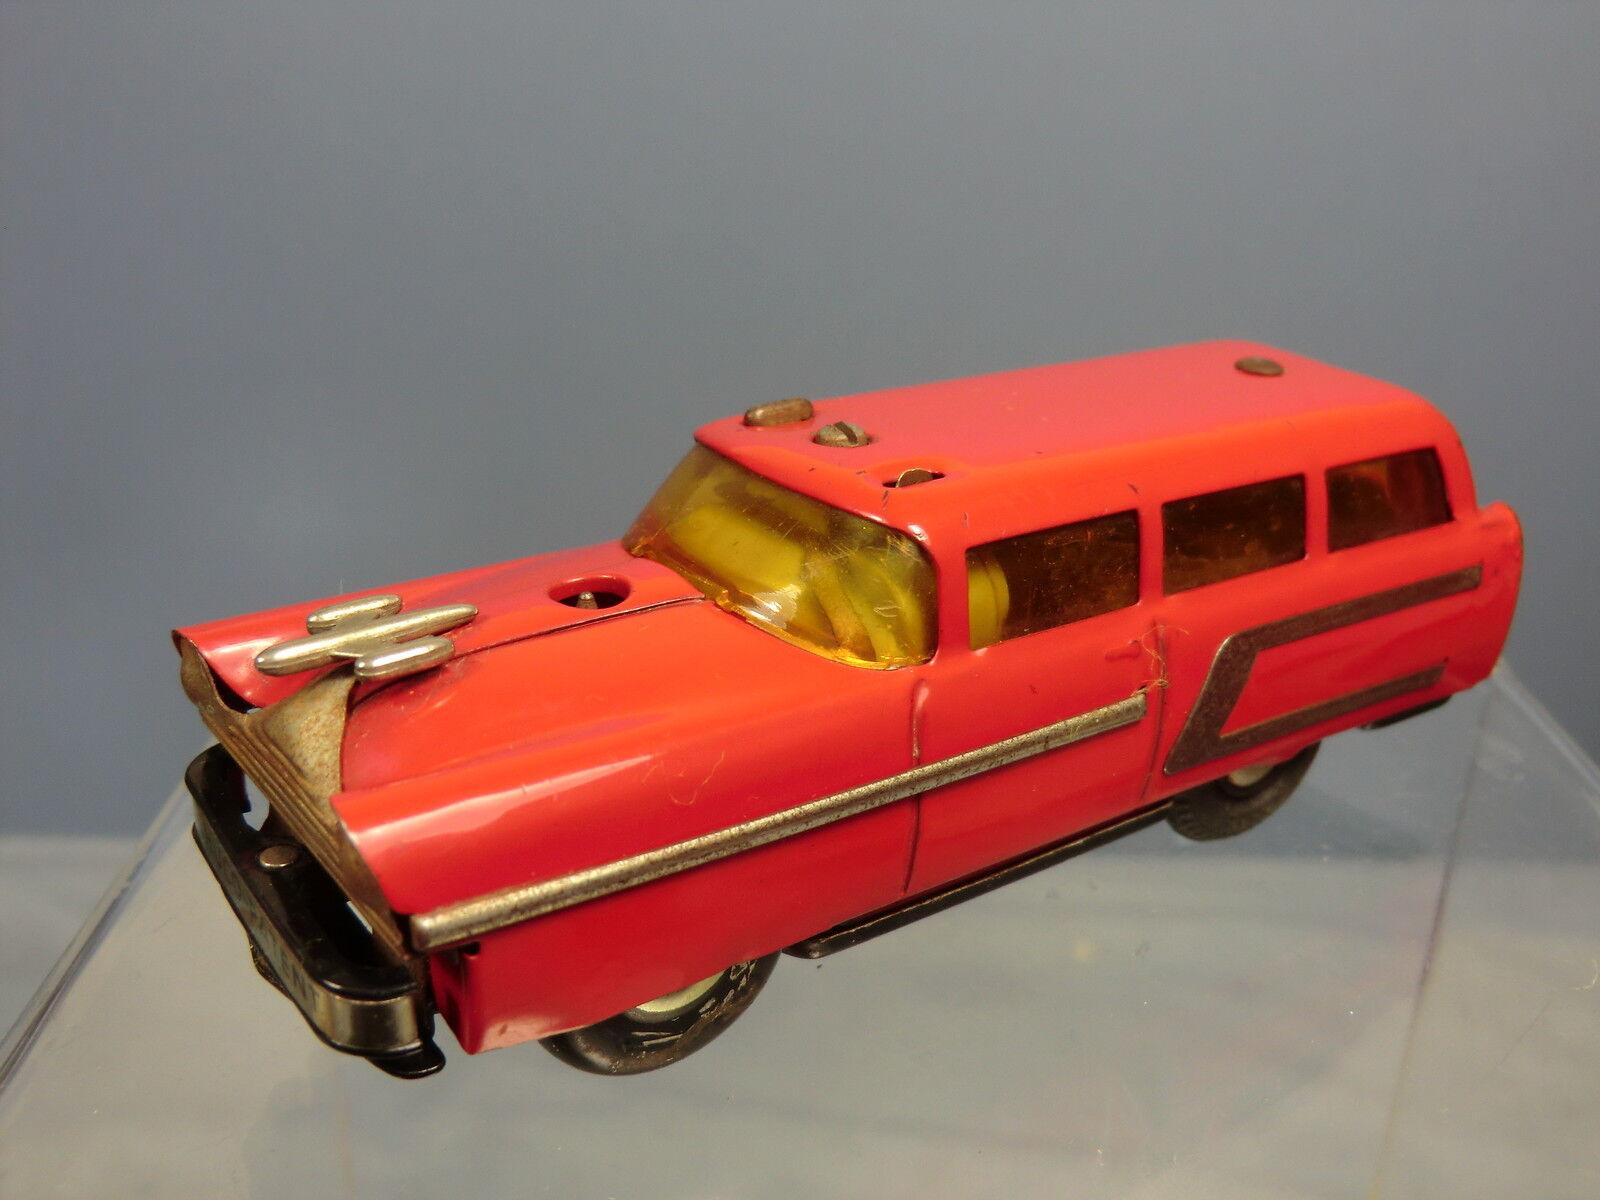 VINTAGE  SCHUCO BATTERY OPERATED MODEL No.3118 VARIATO ELEKTRO STATION CAR